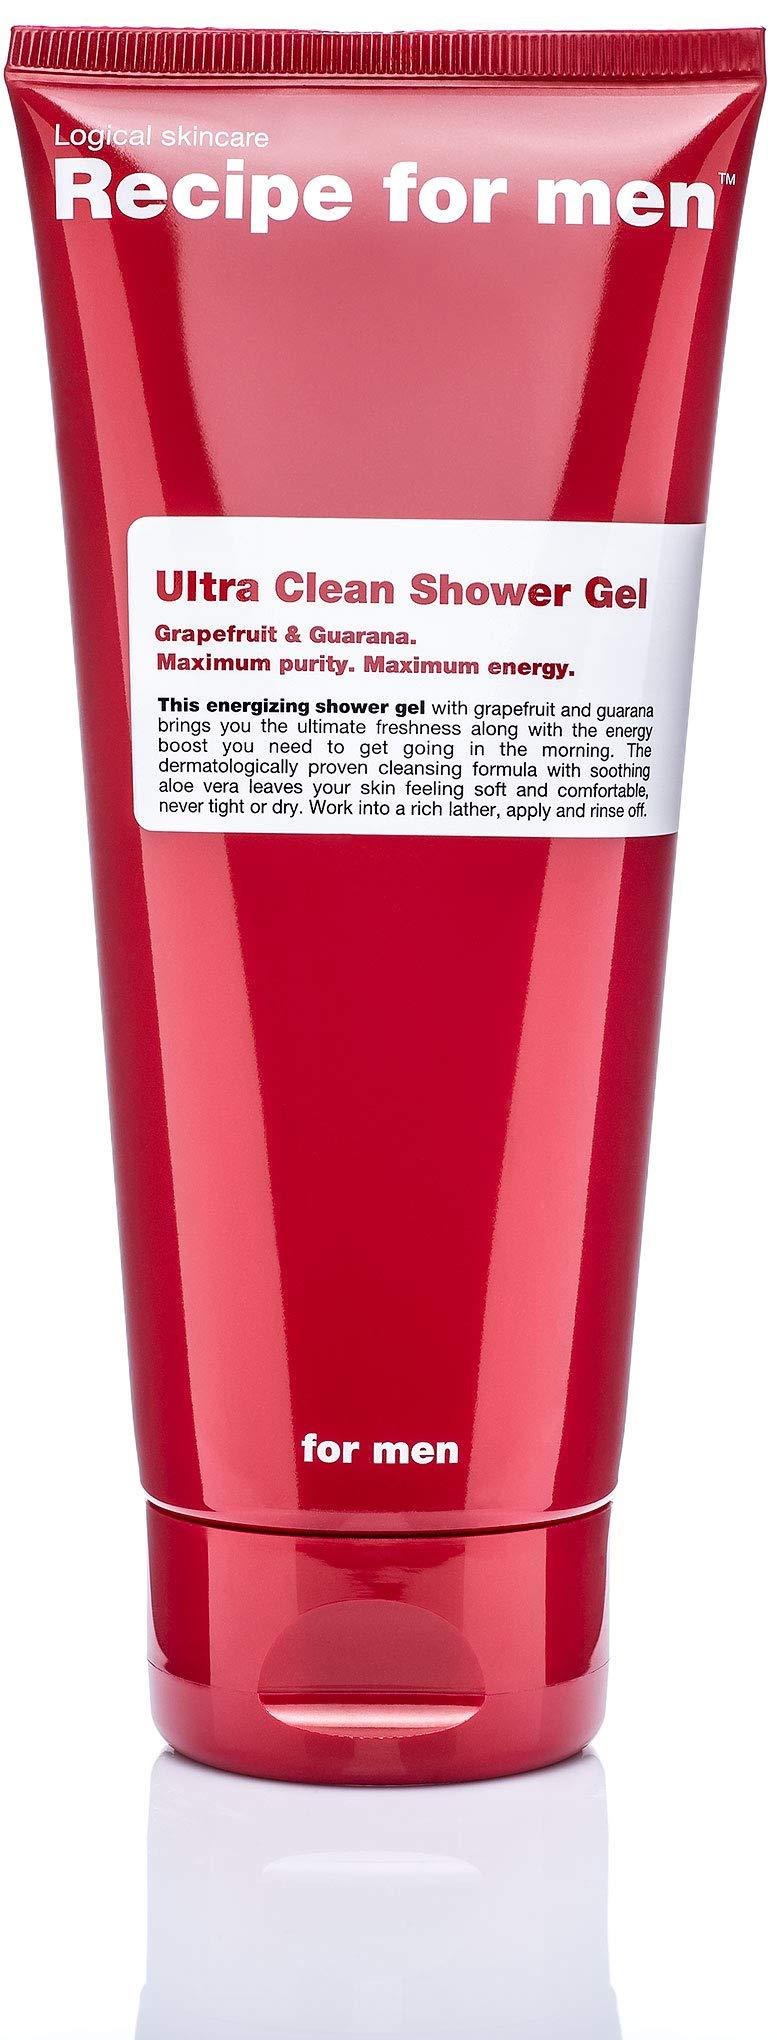 Recipe for Men Ultra Clean Shower Gel, 6.7 Fl Oz by Recipe for Men